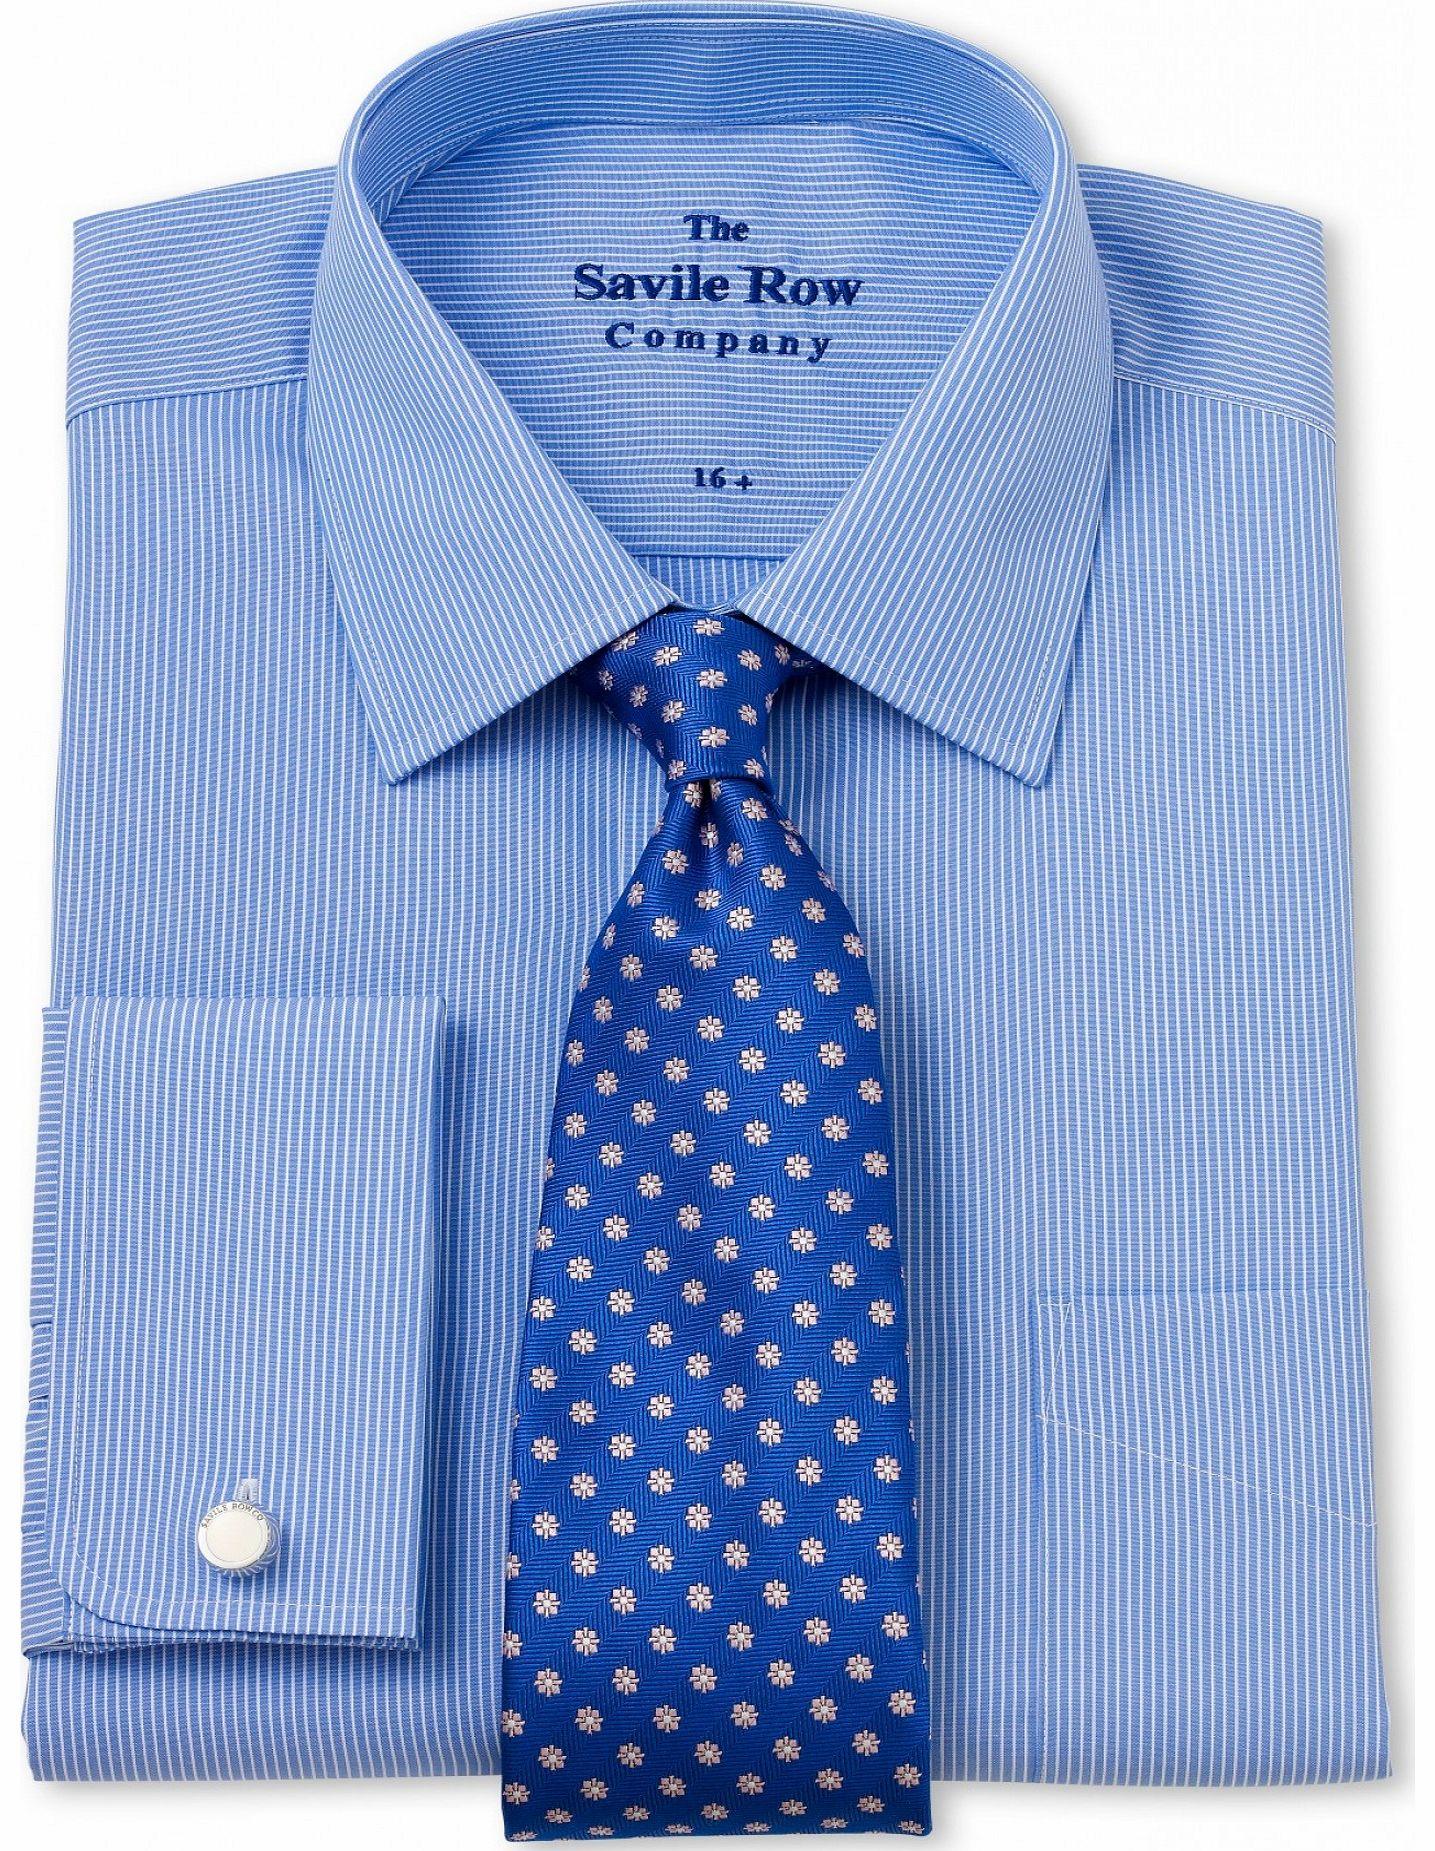 Savile Row Company Blue White Stripe Classic Fit Shirt 16